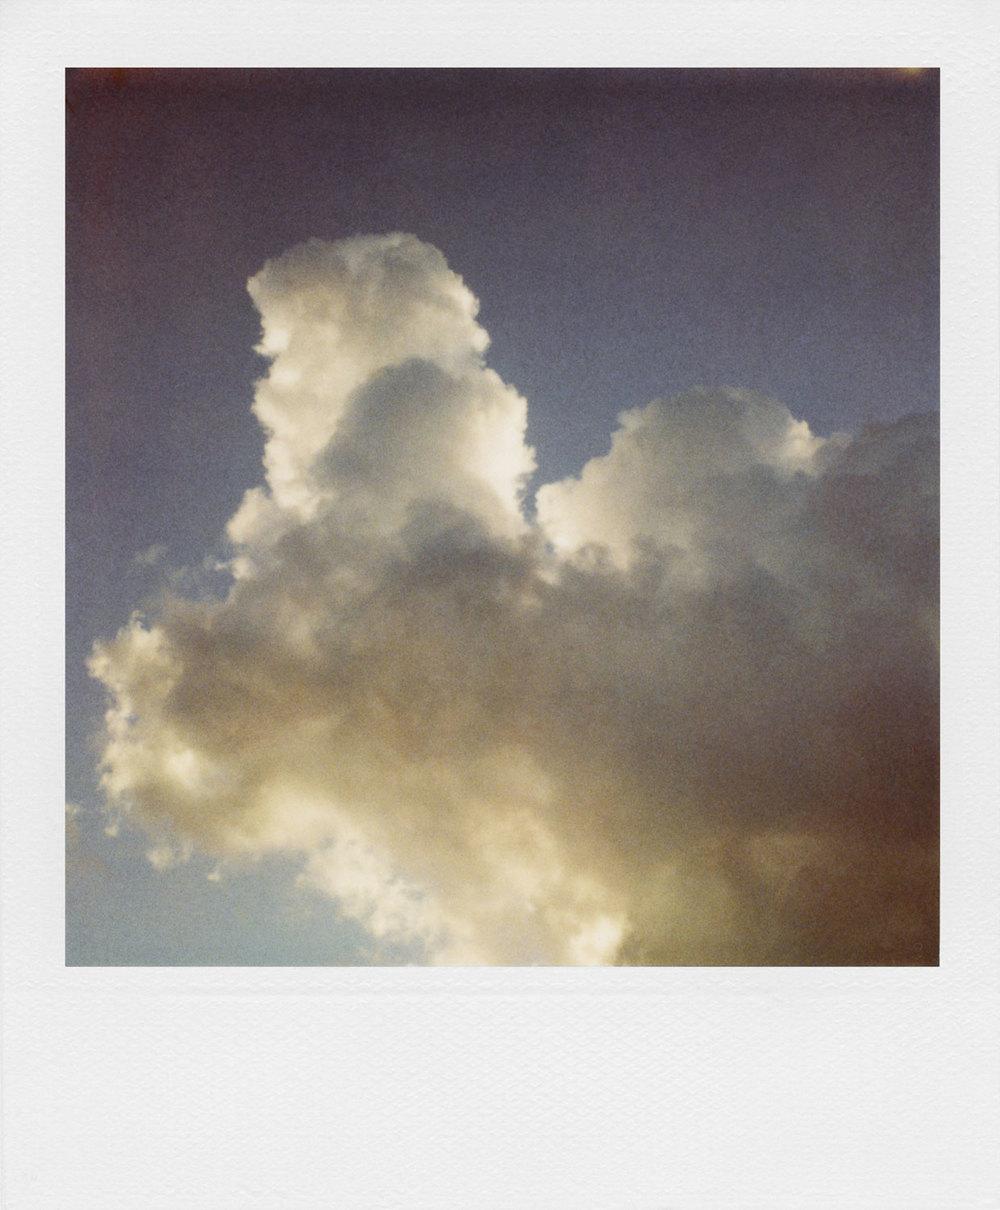 polaroid-61.jpg